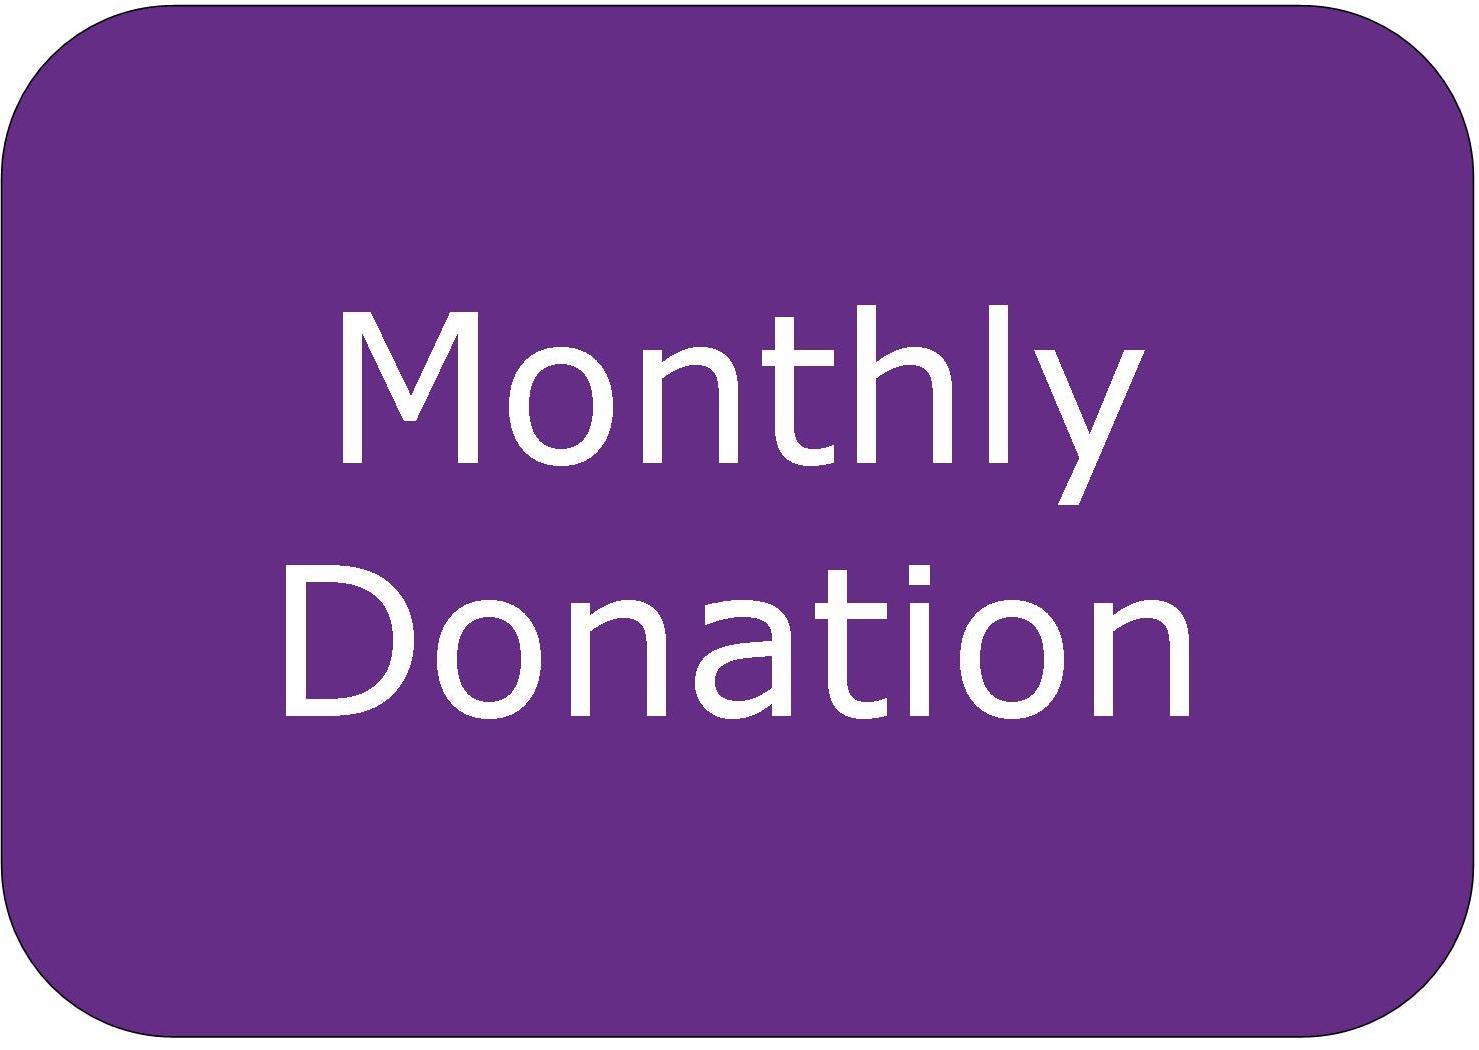 purple_oval_basic_monthly_donation.jpg